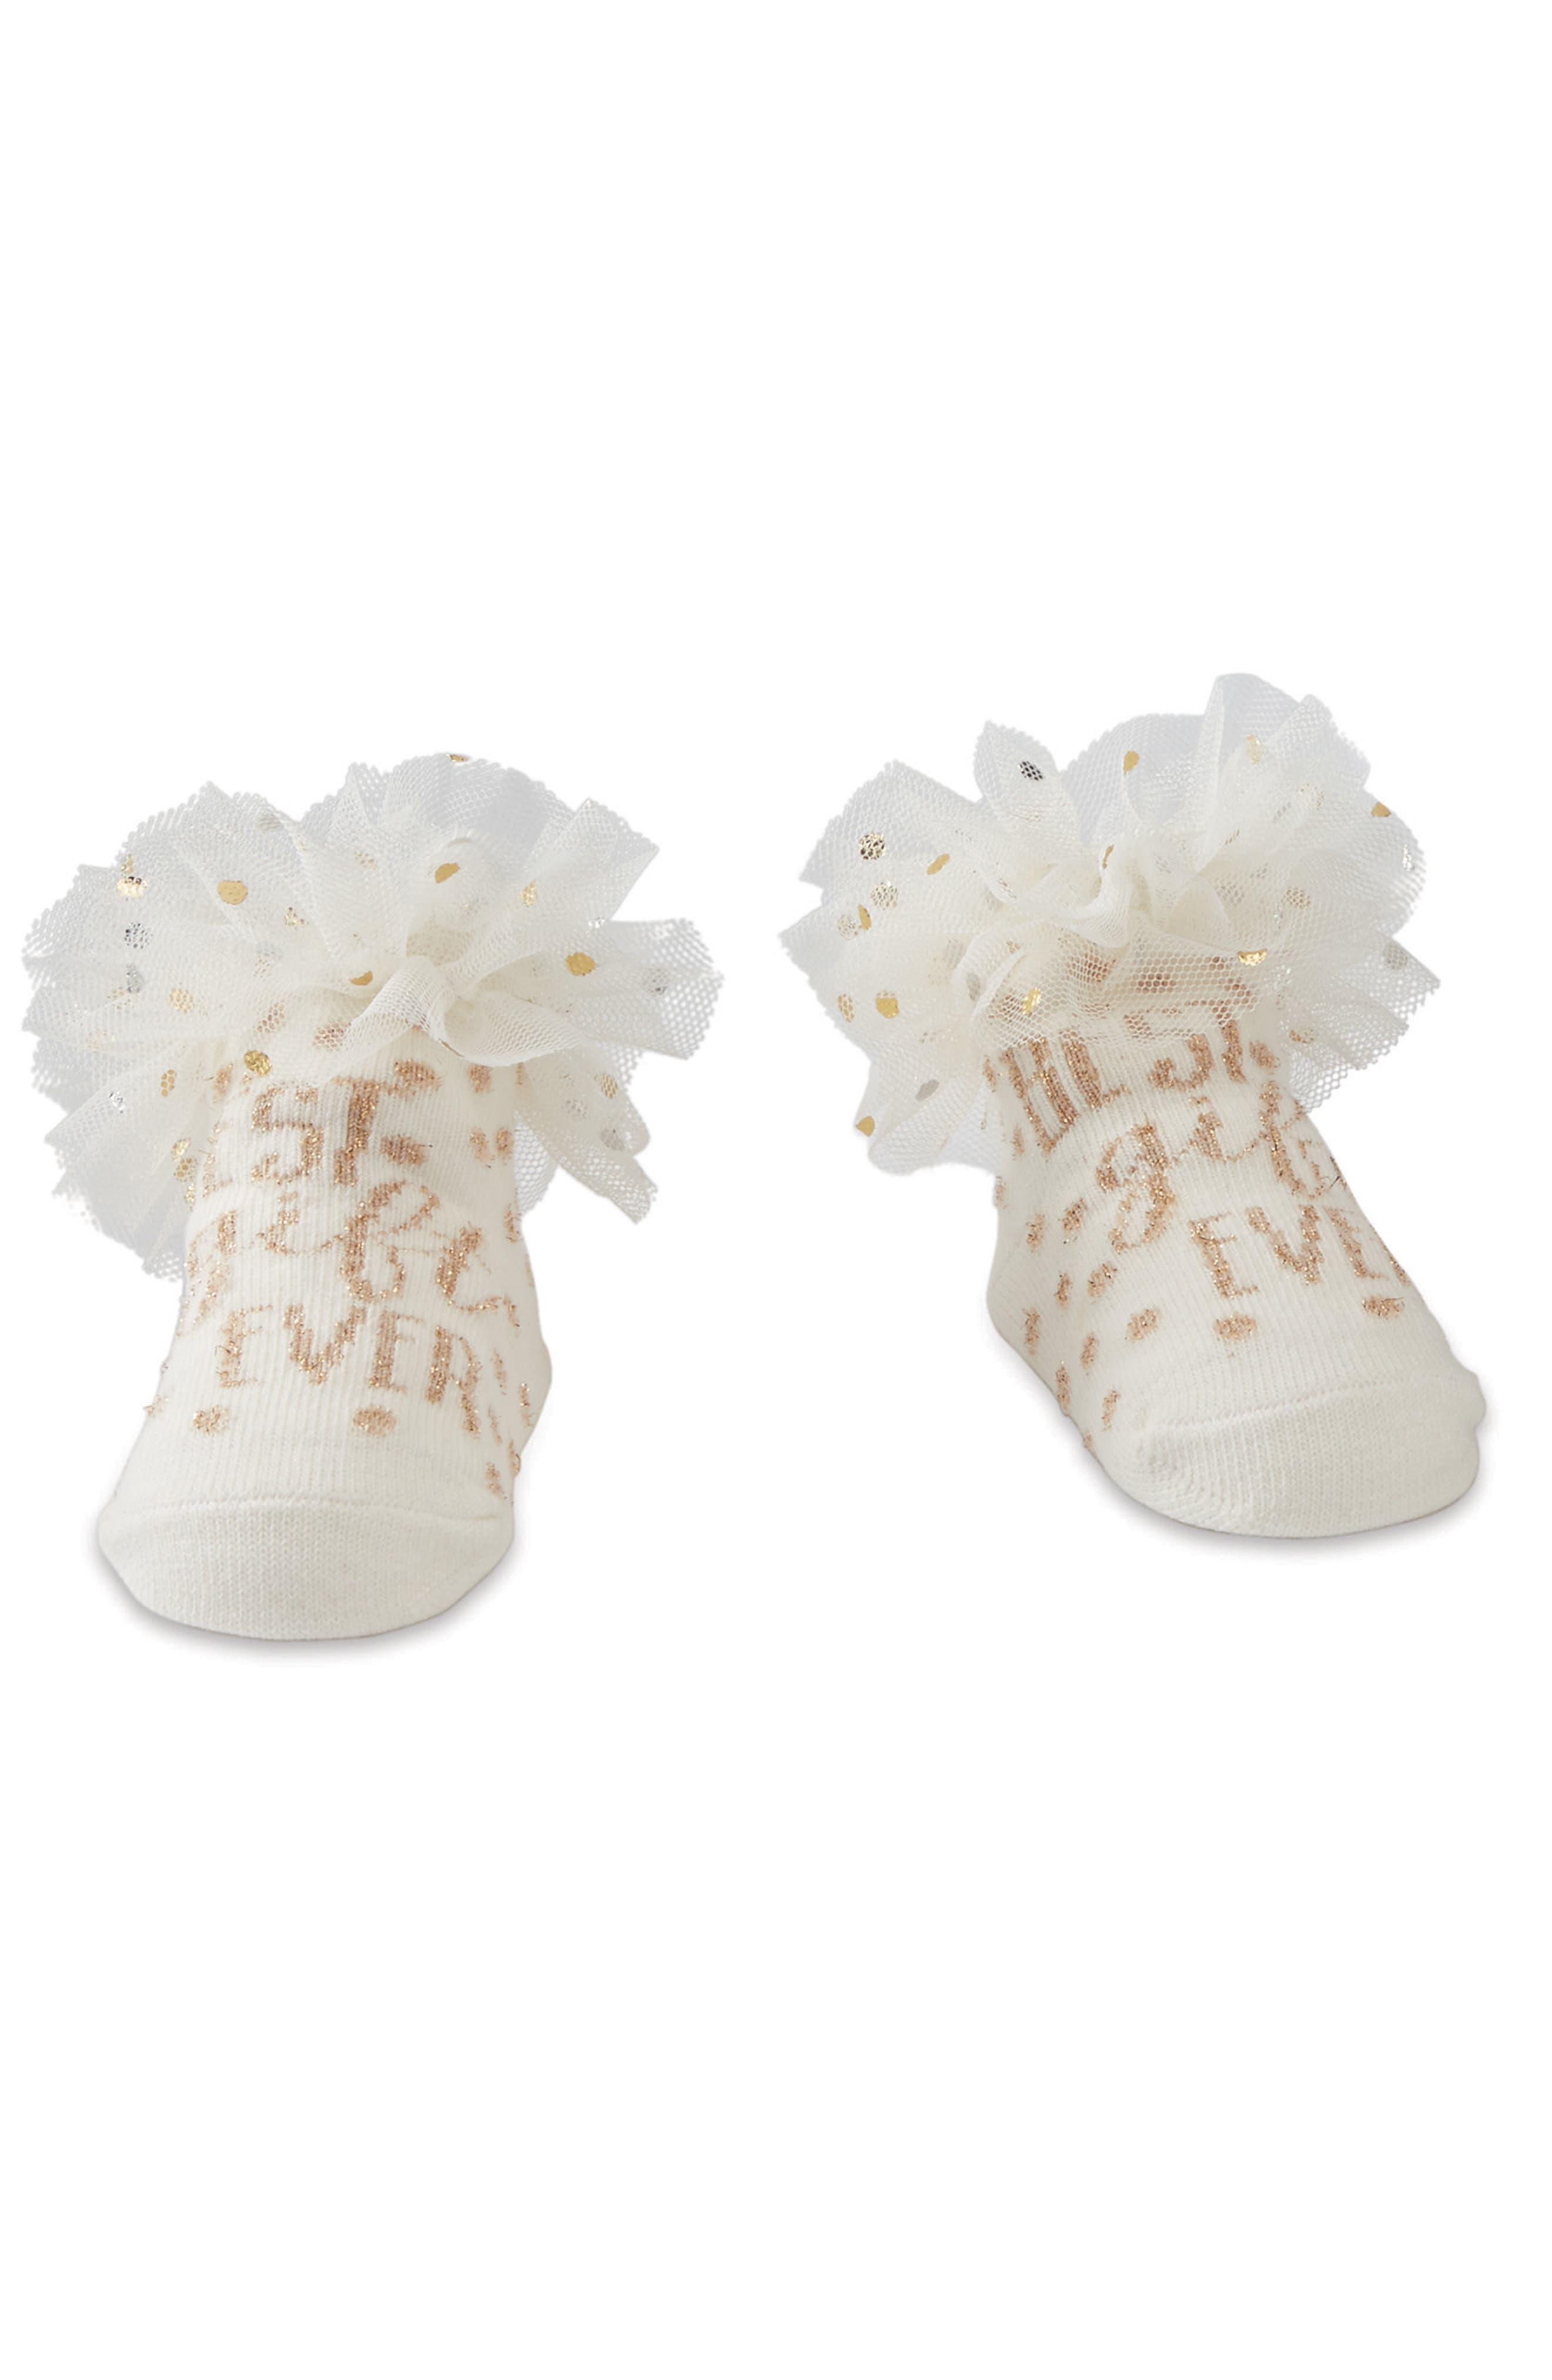 Alternate Image 1 Selected - Mud Pie Best Gift Ever Ruffle Socks (Baby)